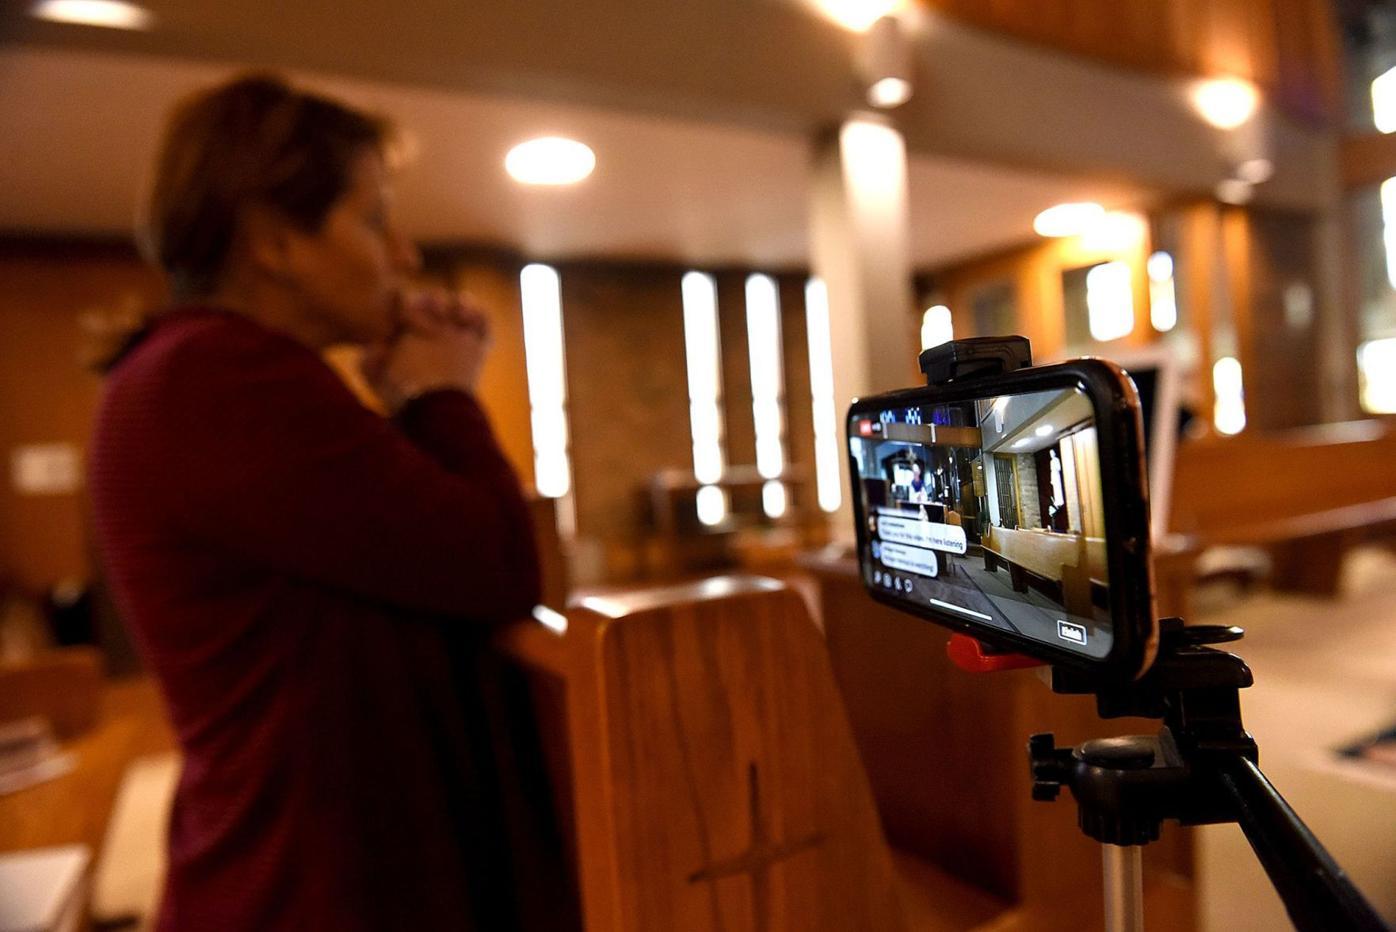 Parish secretary Kerri Stanley prays